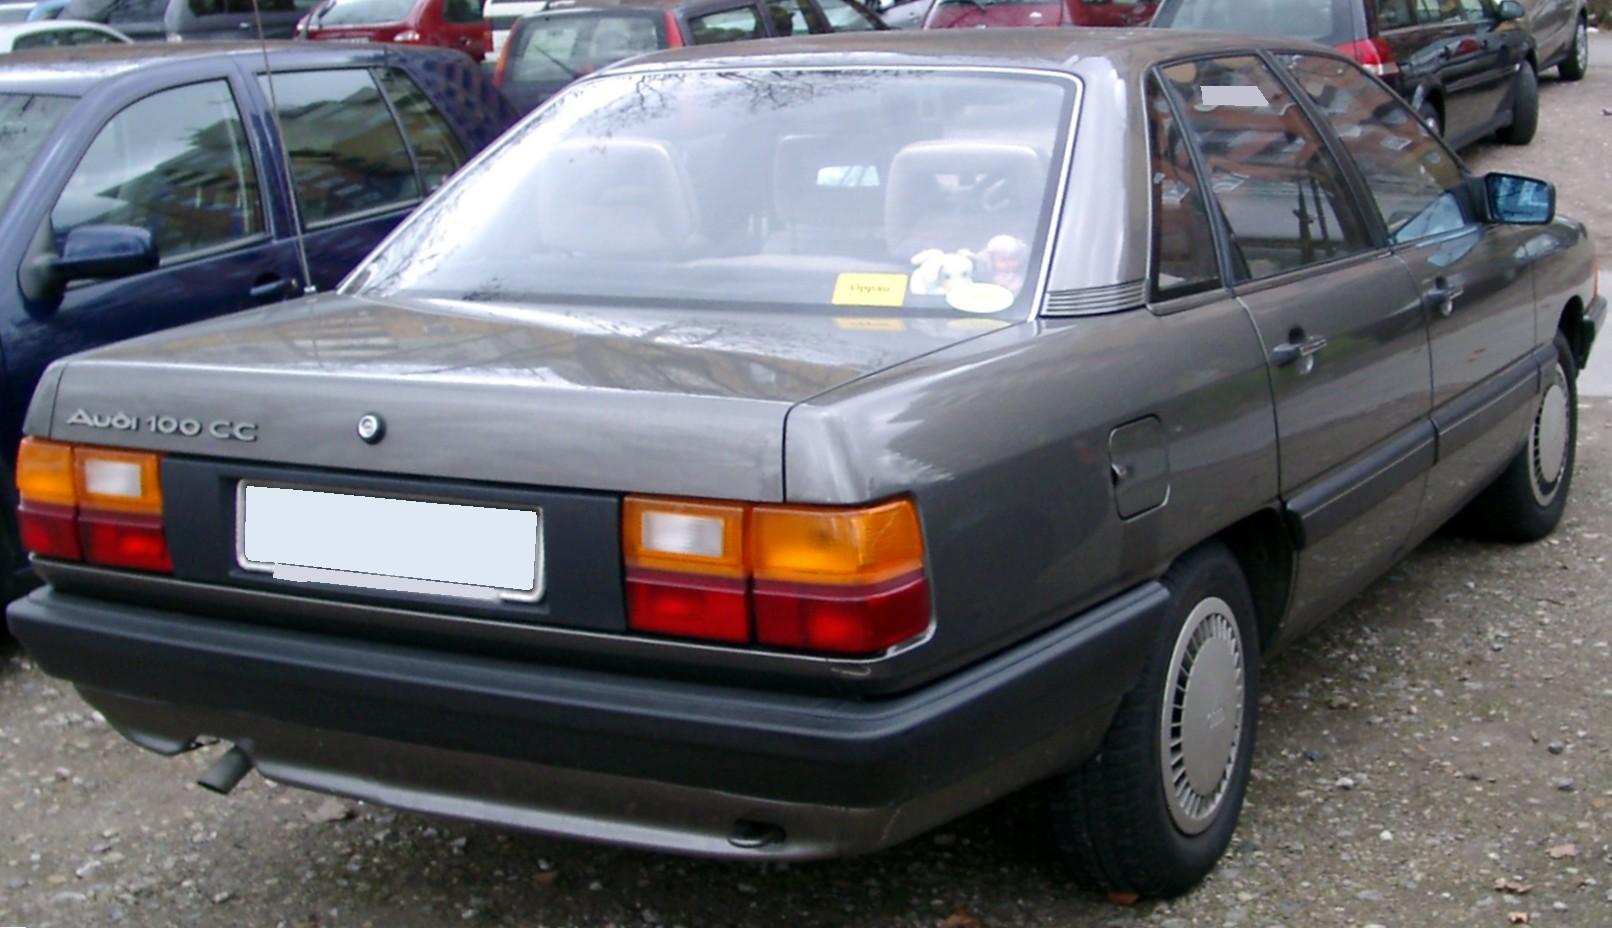 File:Audi 100 C3 rear 20080228.jpg - Wikimedia Commons